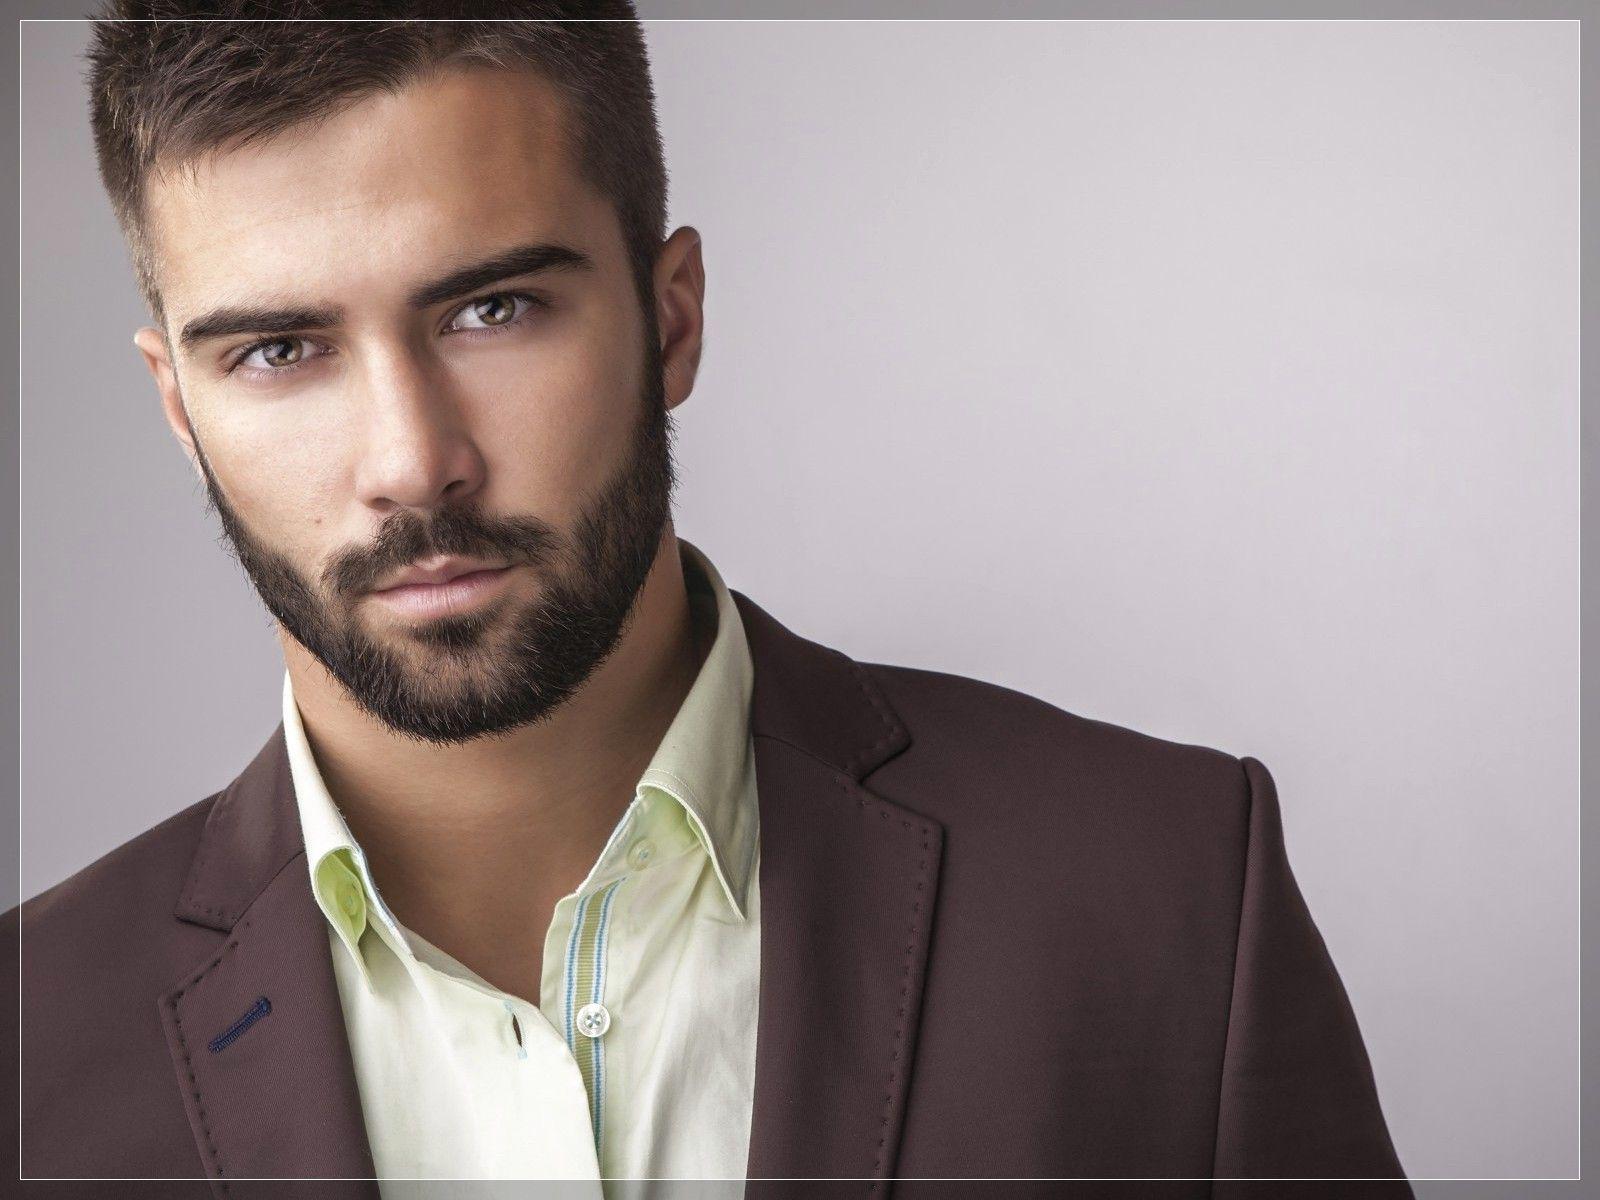 Beard Styles For Men With Round Face Beard Styles For Men Short